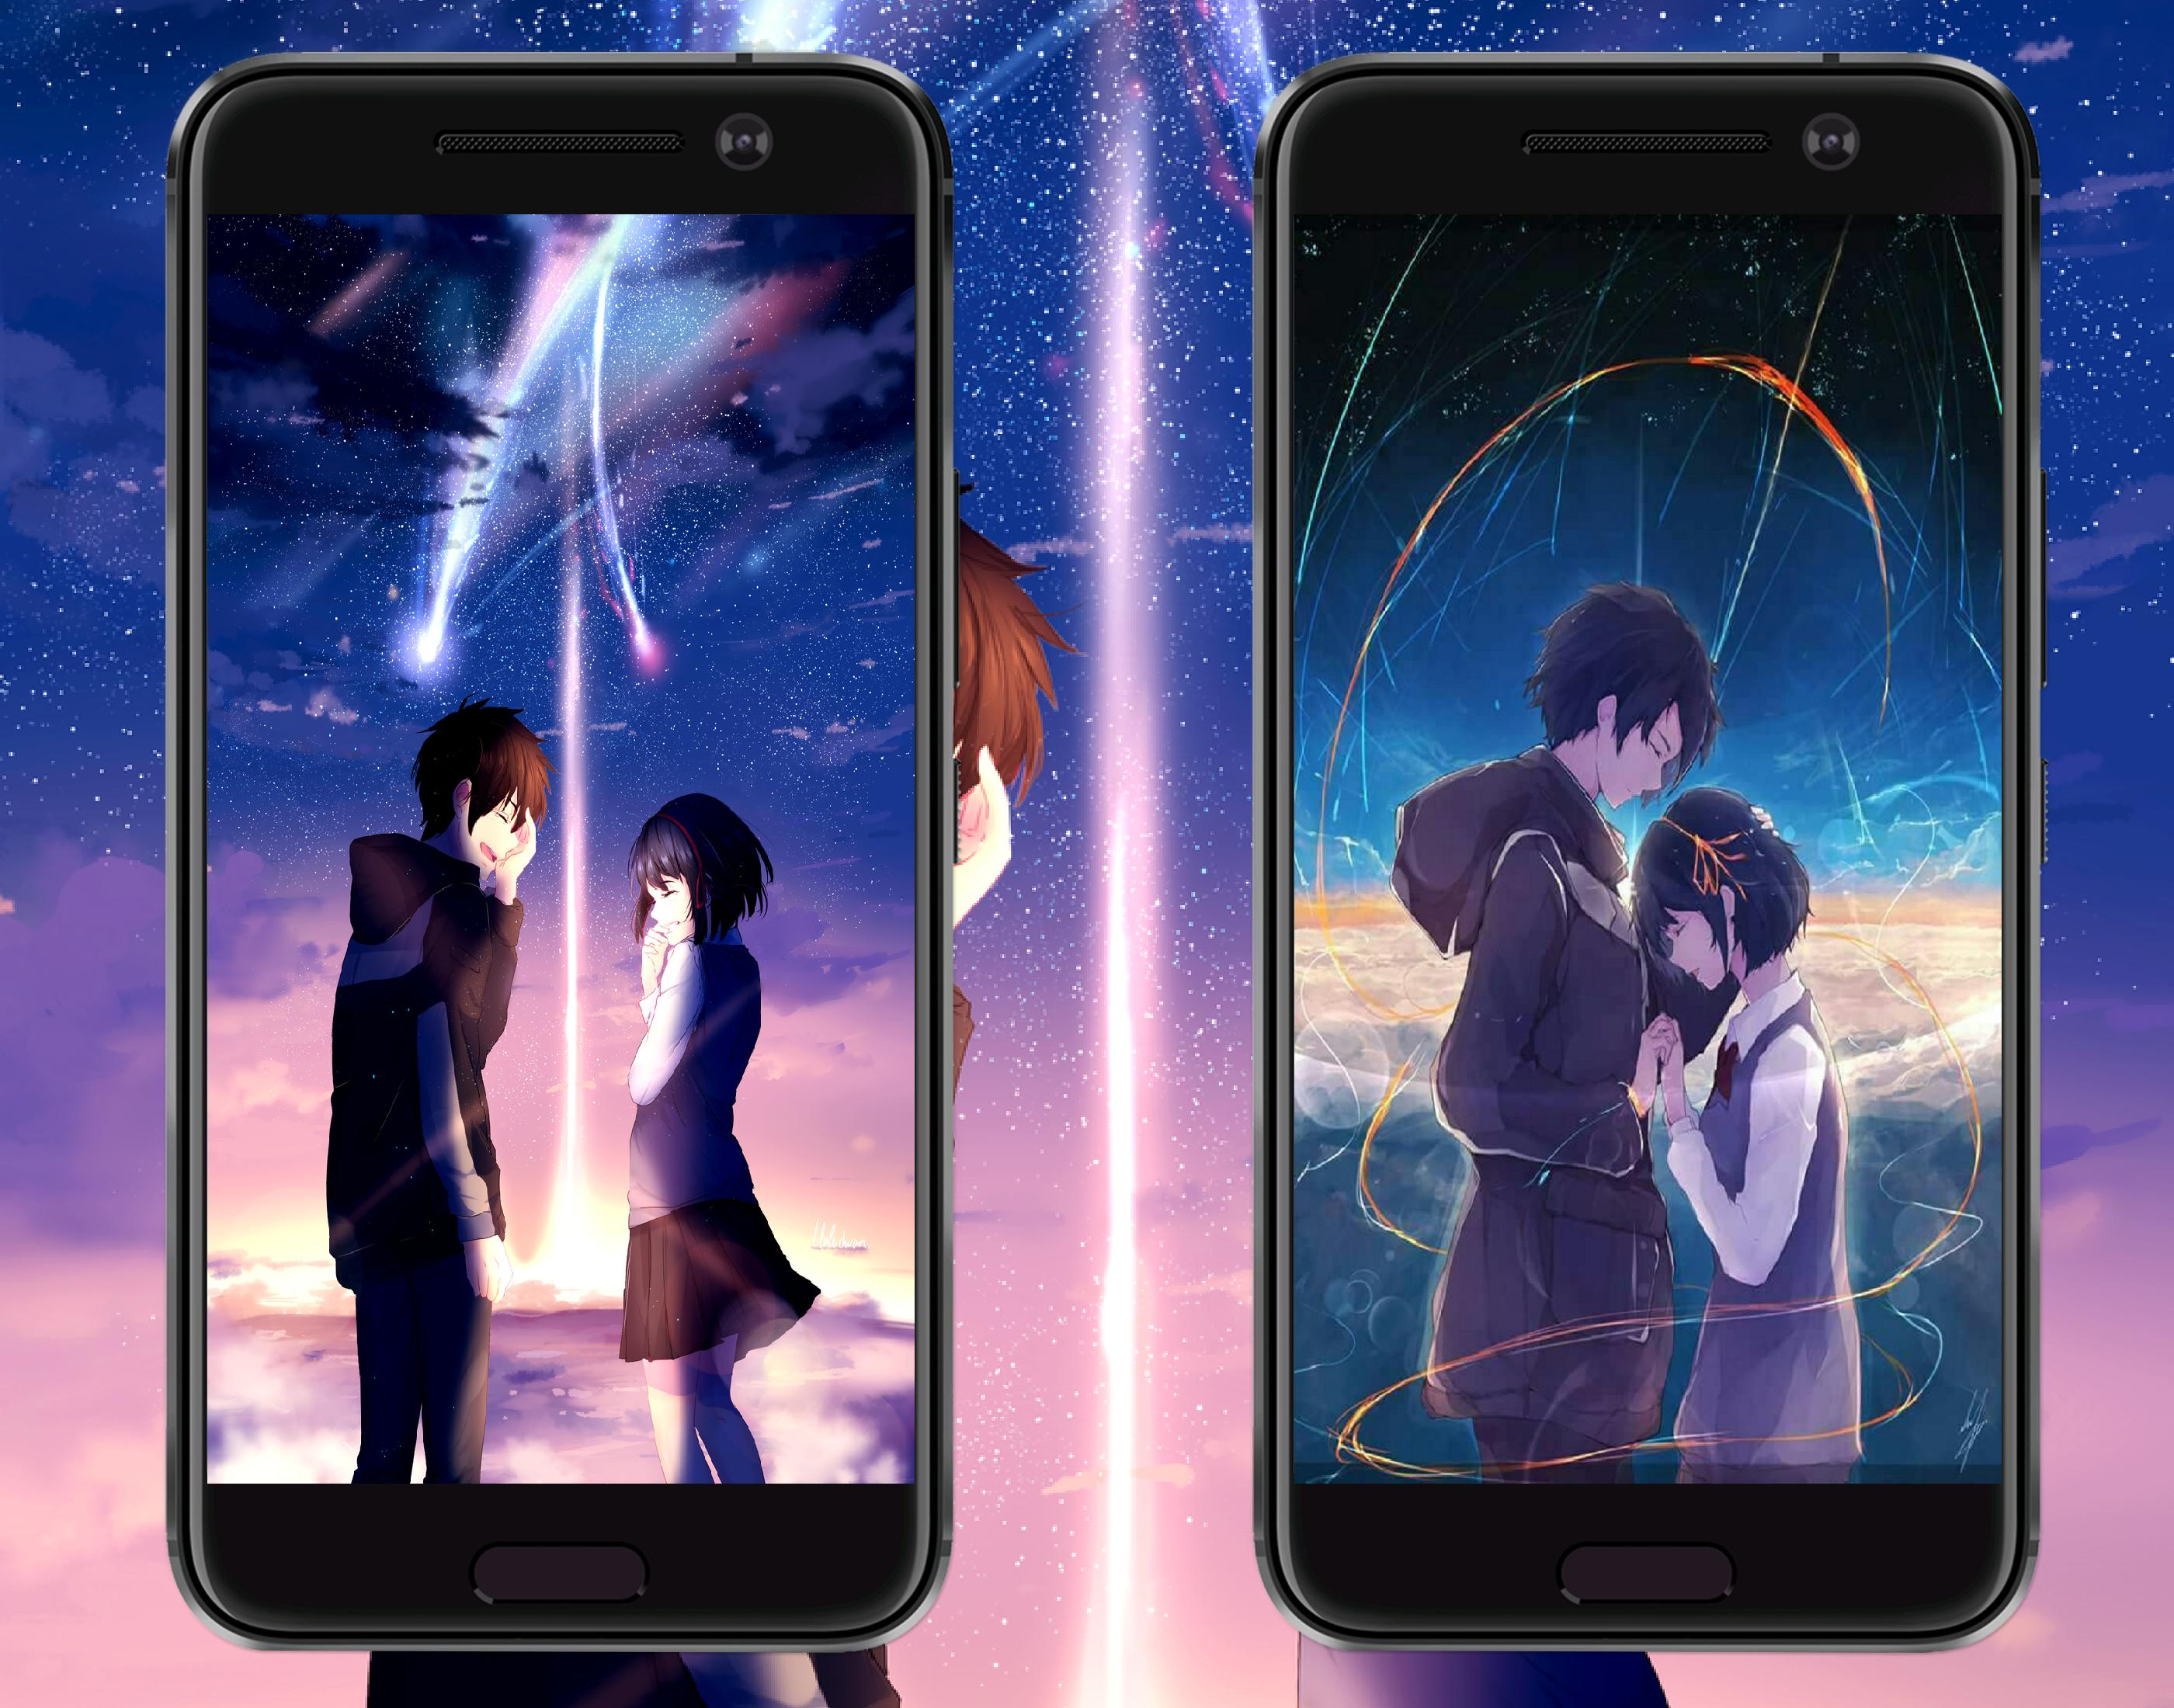 Kimi No Nawa Wallpaper Hd For Android Apk Download